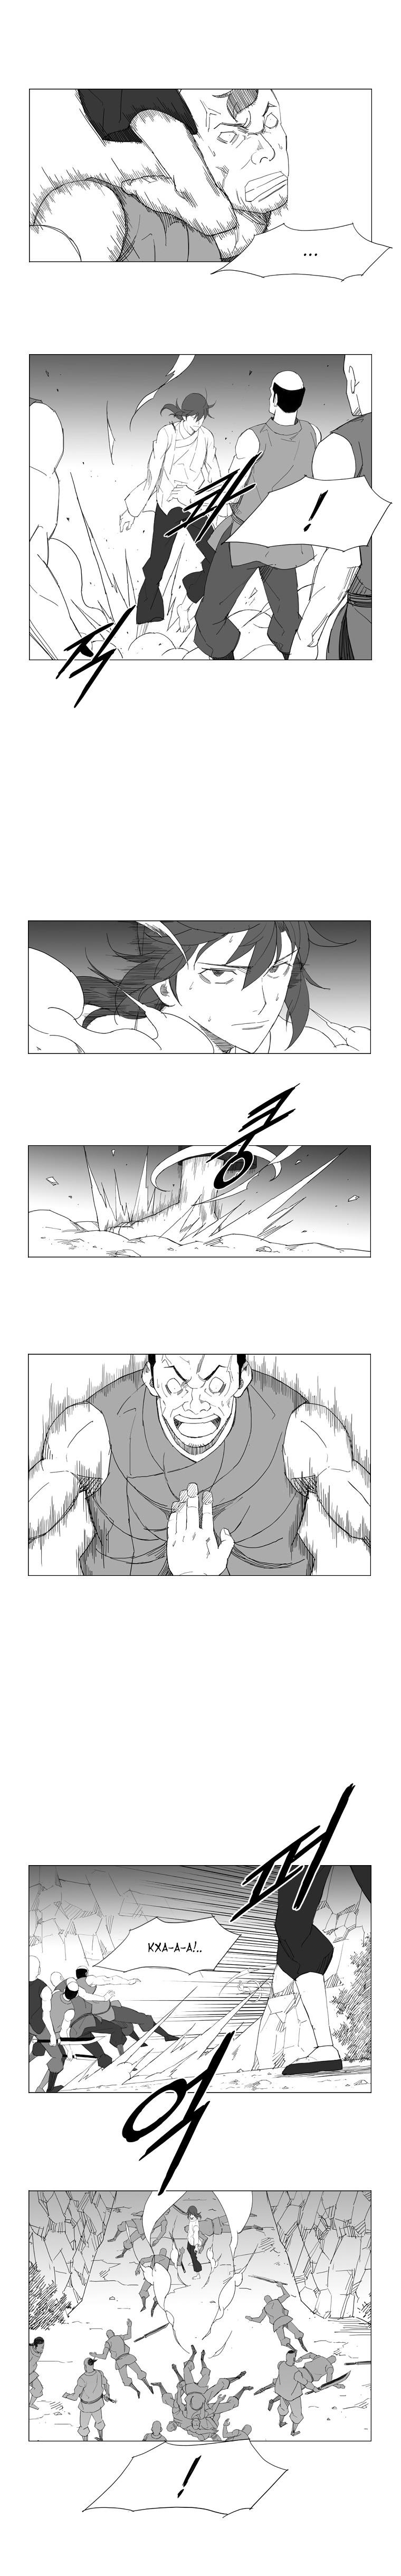 https://r1.ninemanga.com/comics/pic2/39/28263/331326/1502309151397.jpg Page 2